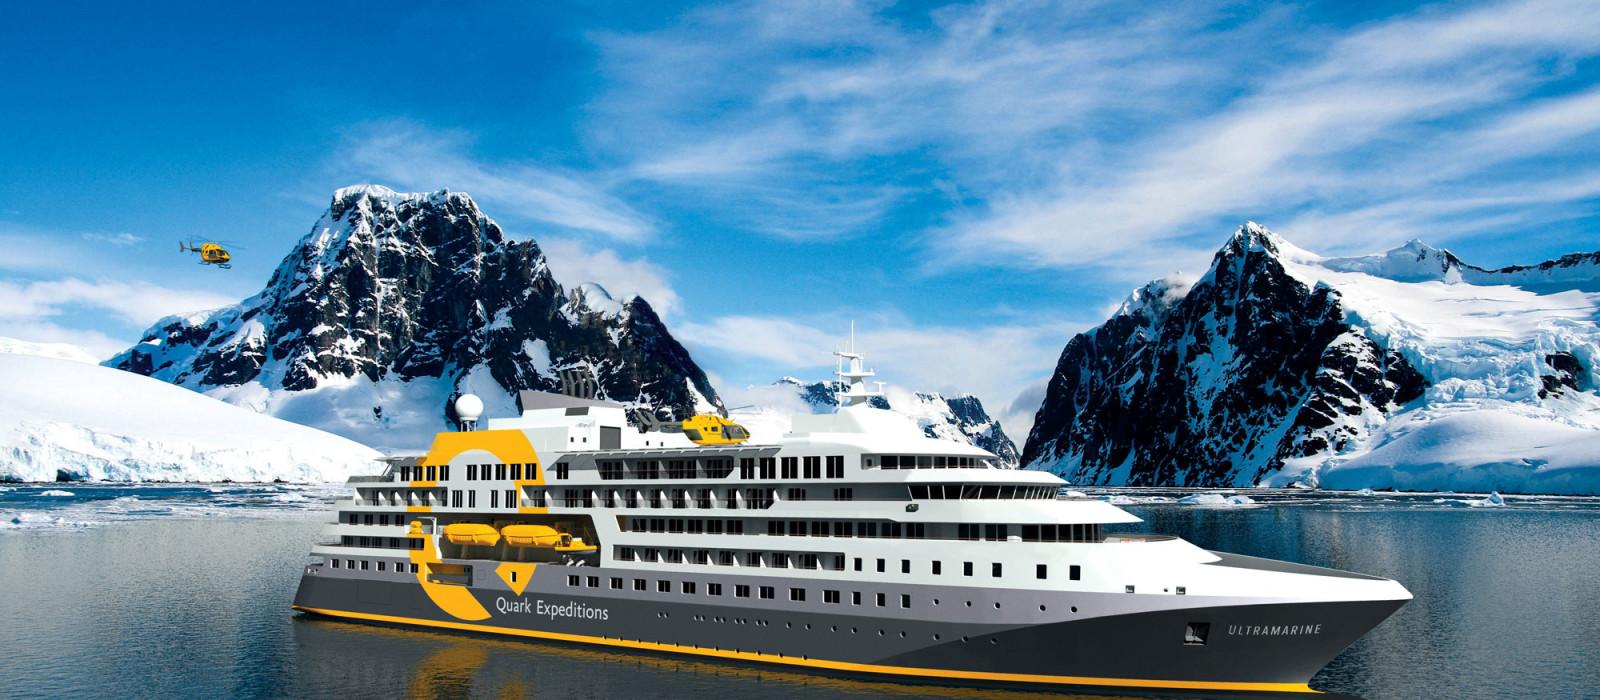 Hotel Ultramarine by Quark Expeditions, Antarctica Antarctica